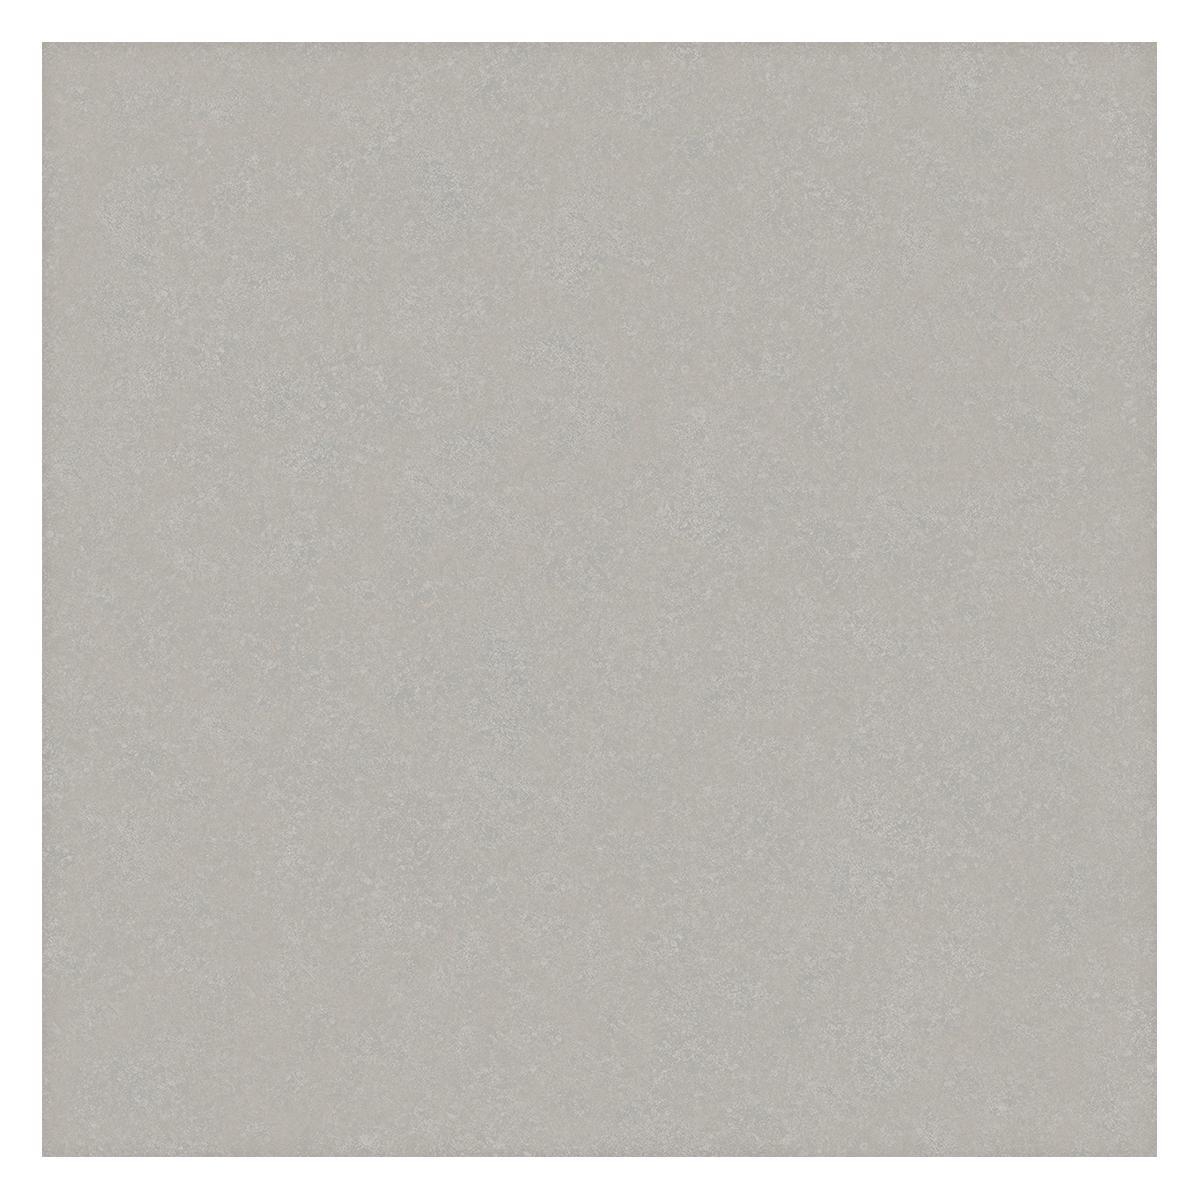 Mayólica Neo Aster Gris Mate - 60X60 cm - 1.44 m2